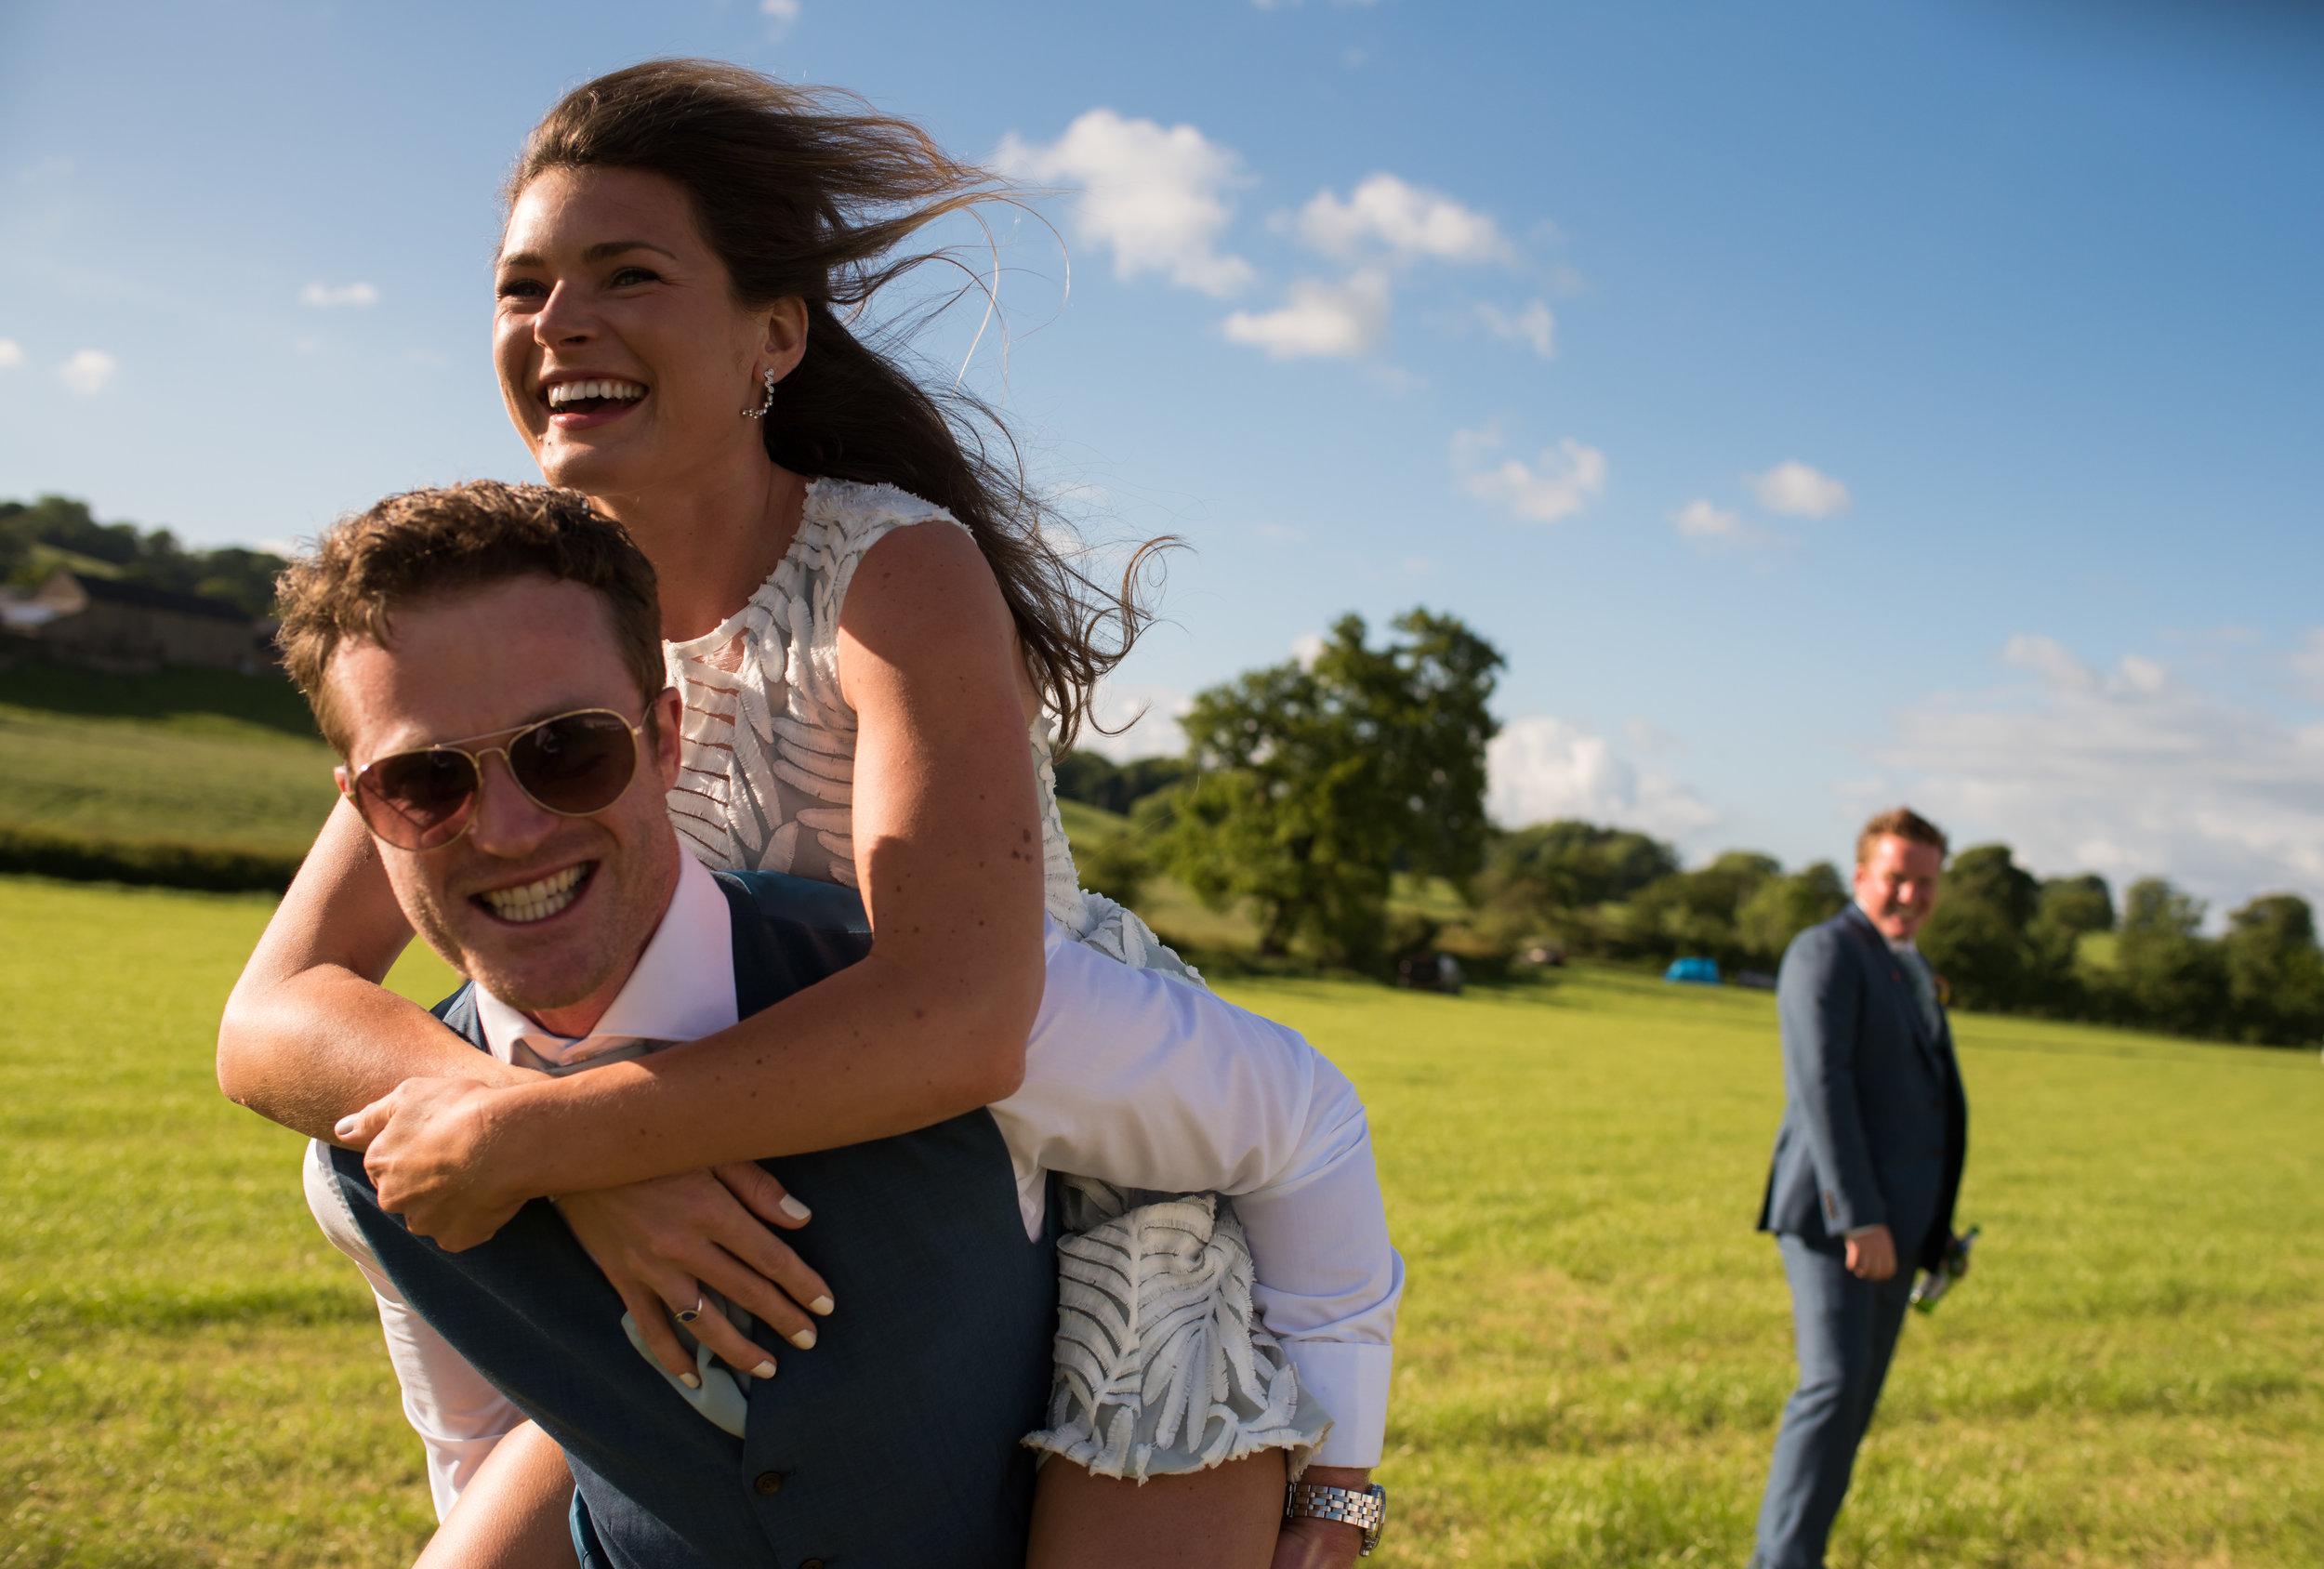 a 'piggybacking' couple run past the camera